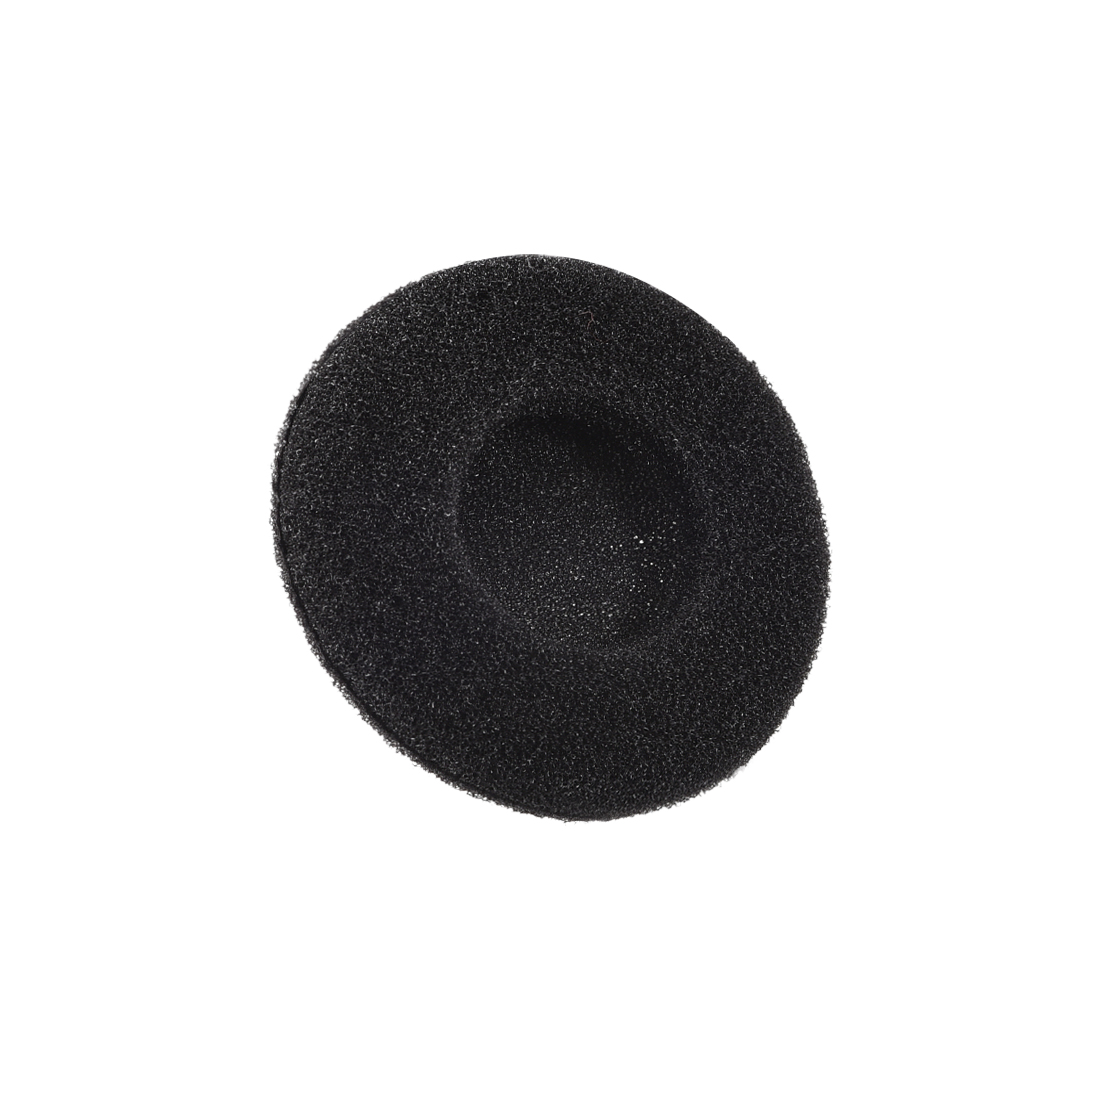 32mm Earphone Foam Ear Pad Sponge Cover For Headphone Headset Black 12pcs